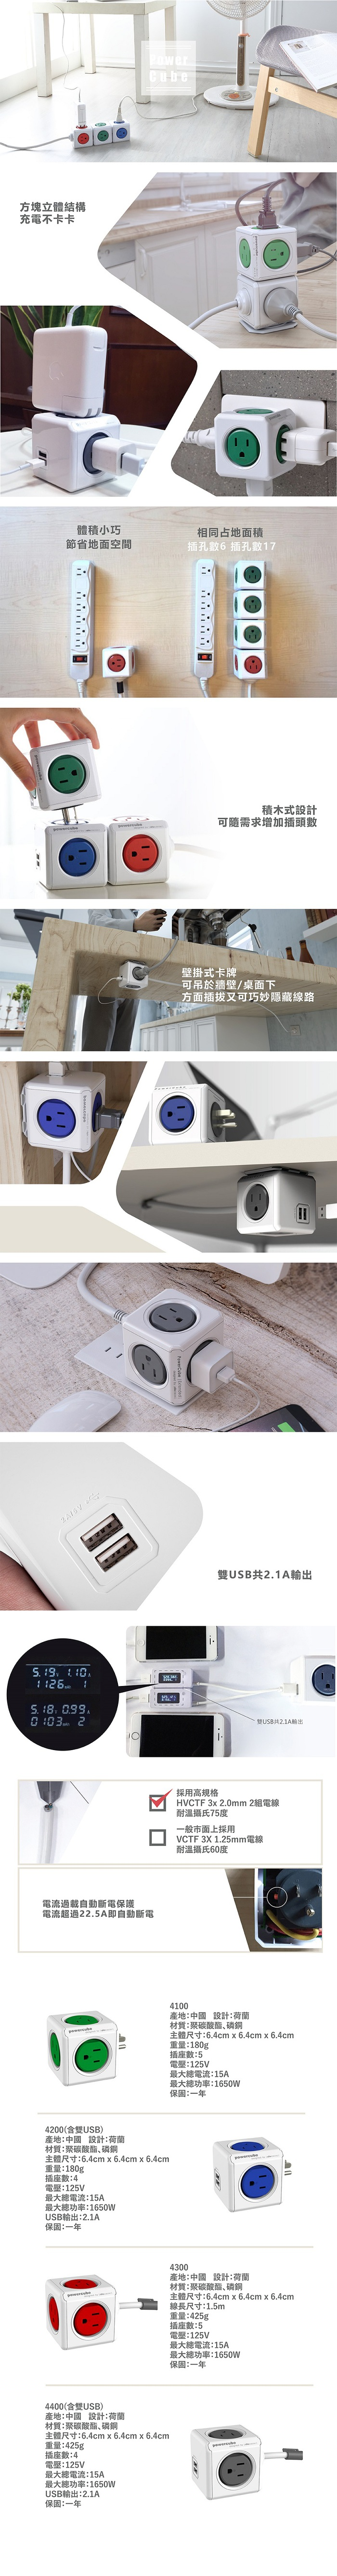 Allocacoc |PowerCube 雙USB擴充插座 - 藍色(4面插座、3孔、2埠USB)